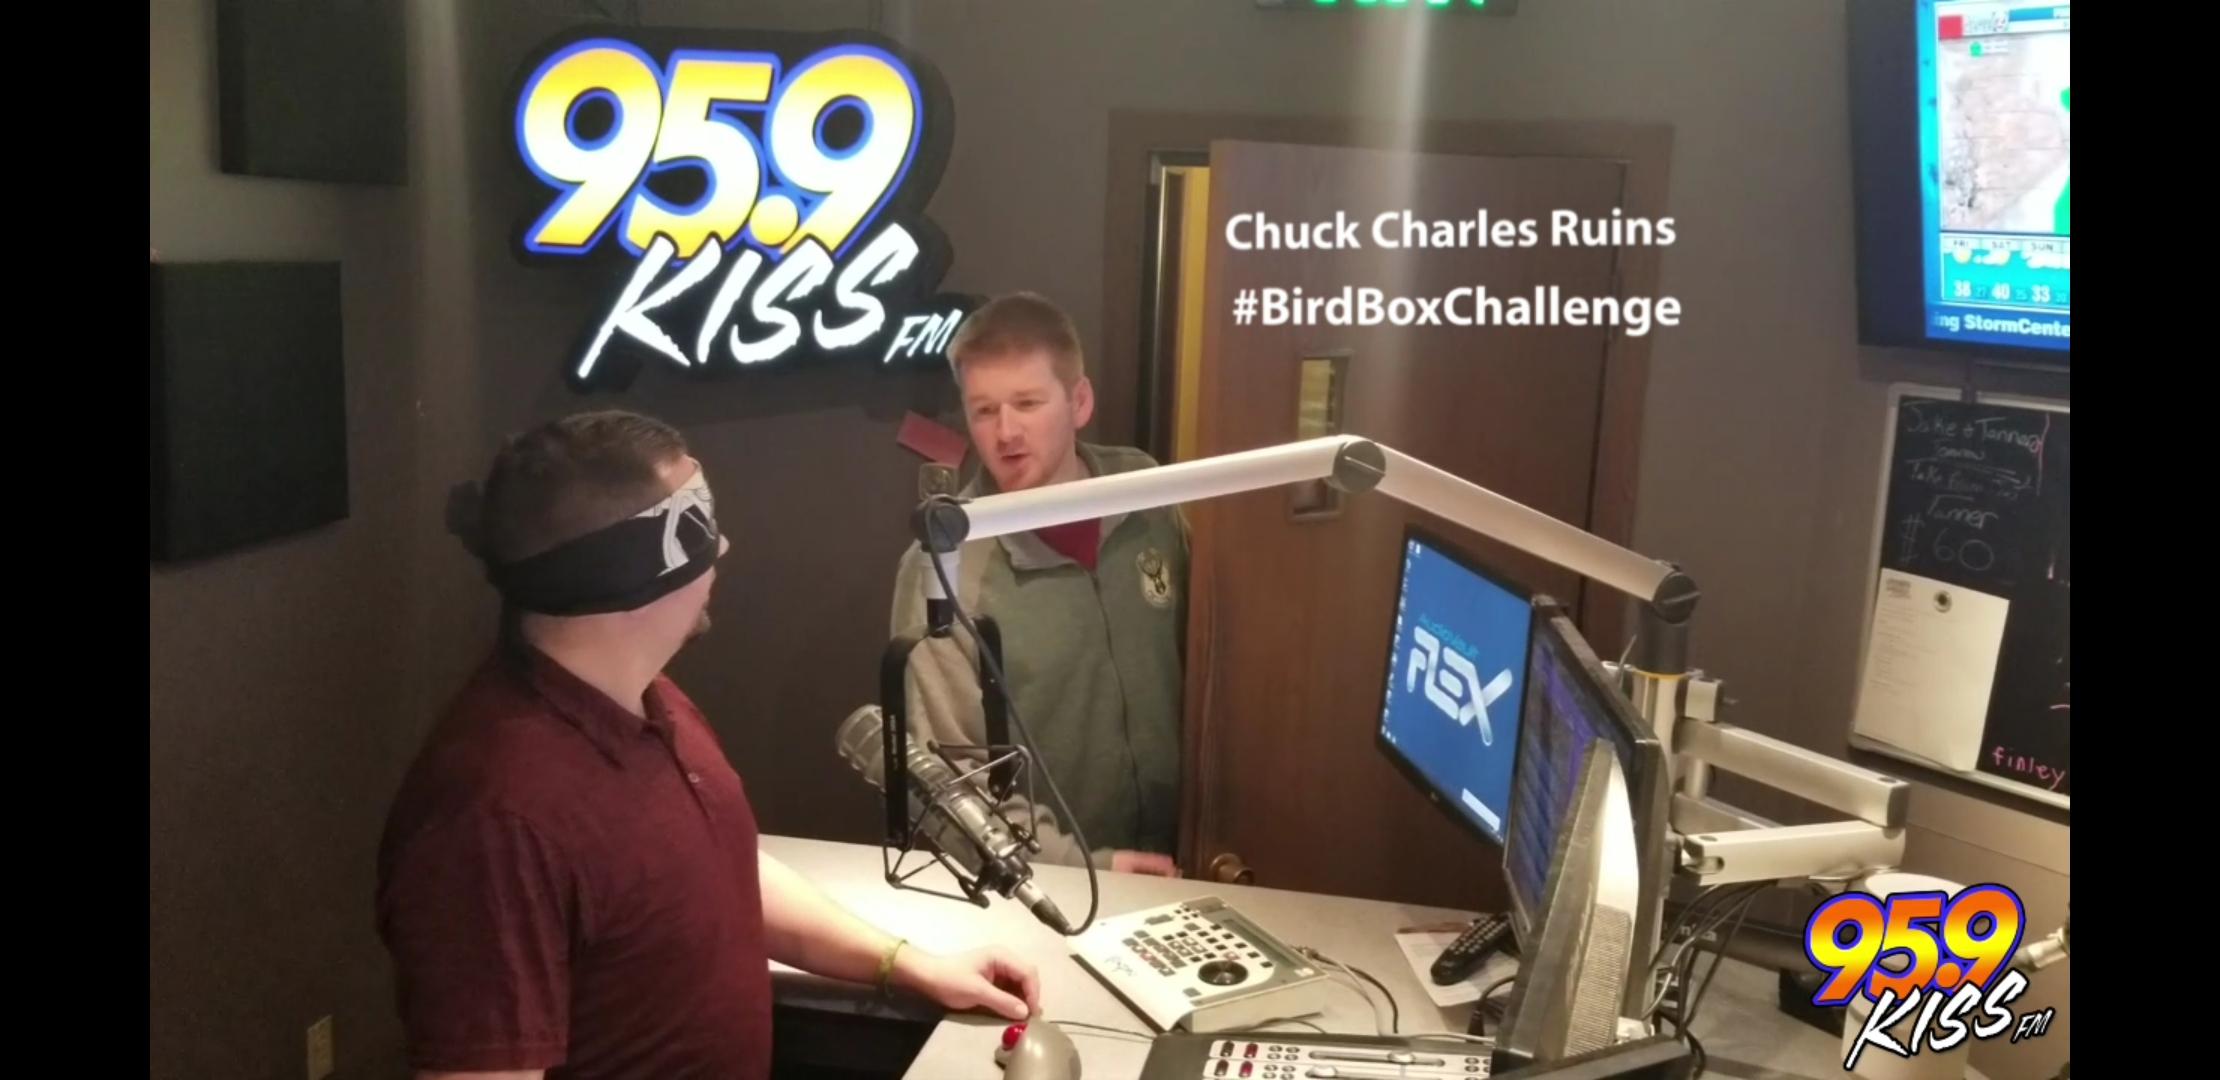 #WhattheChuckWednesday - Chuck Ruins The #BirdBoxChallenge